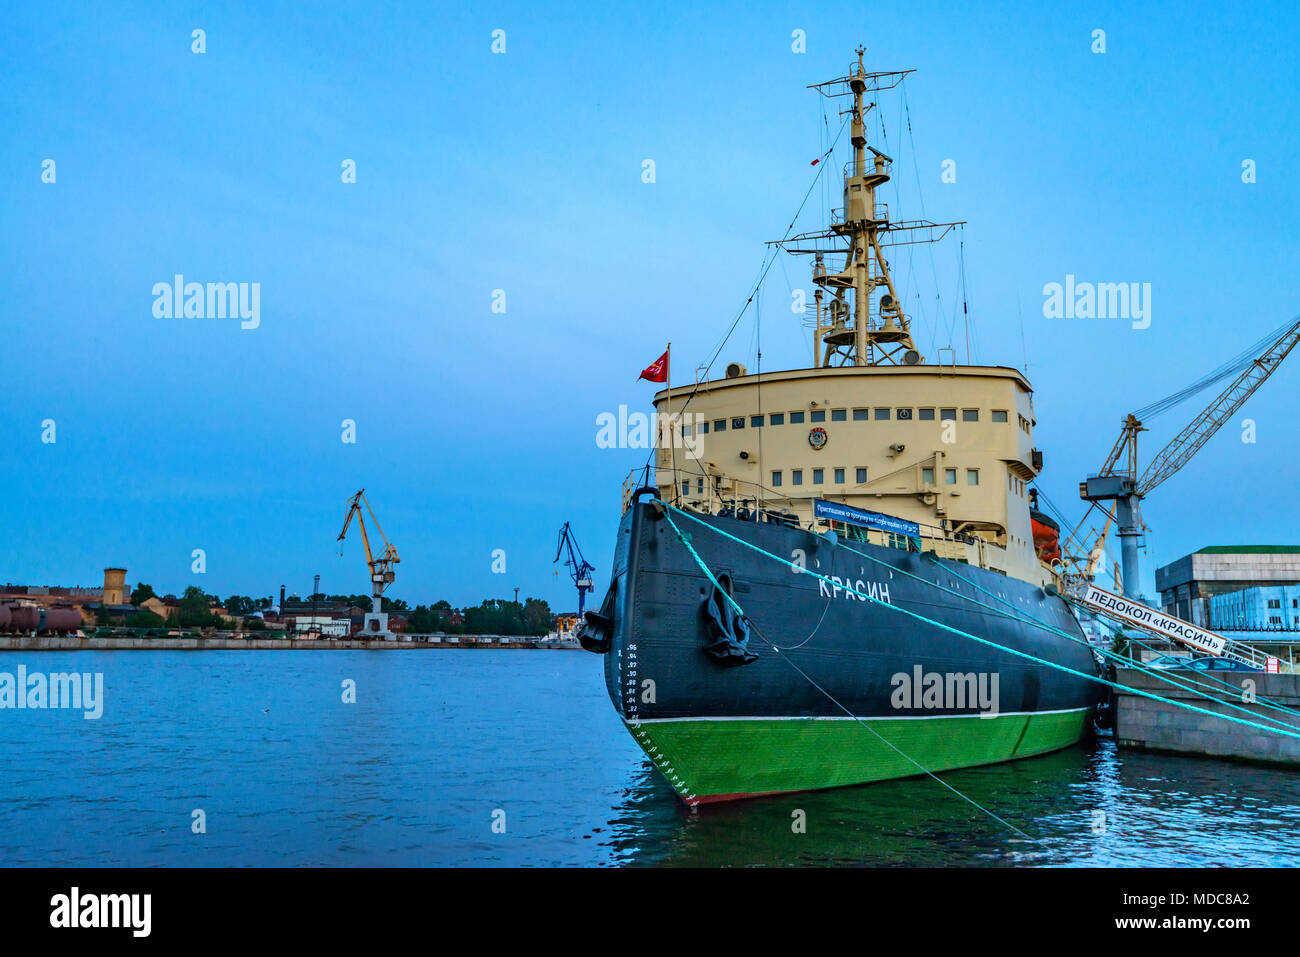 SAINT PETERSBURG - JUNE 14, 2015: Arctic icebreaker Krassin in St.Petersburg - Stock Image